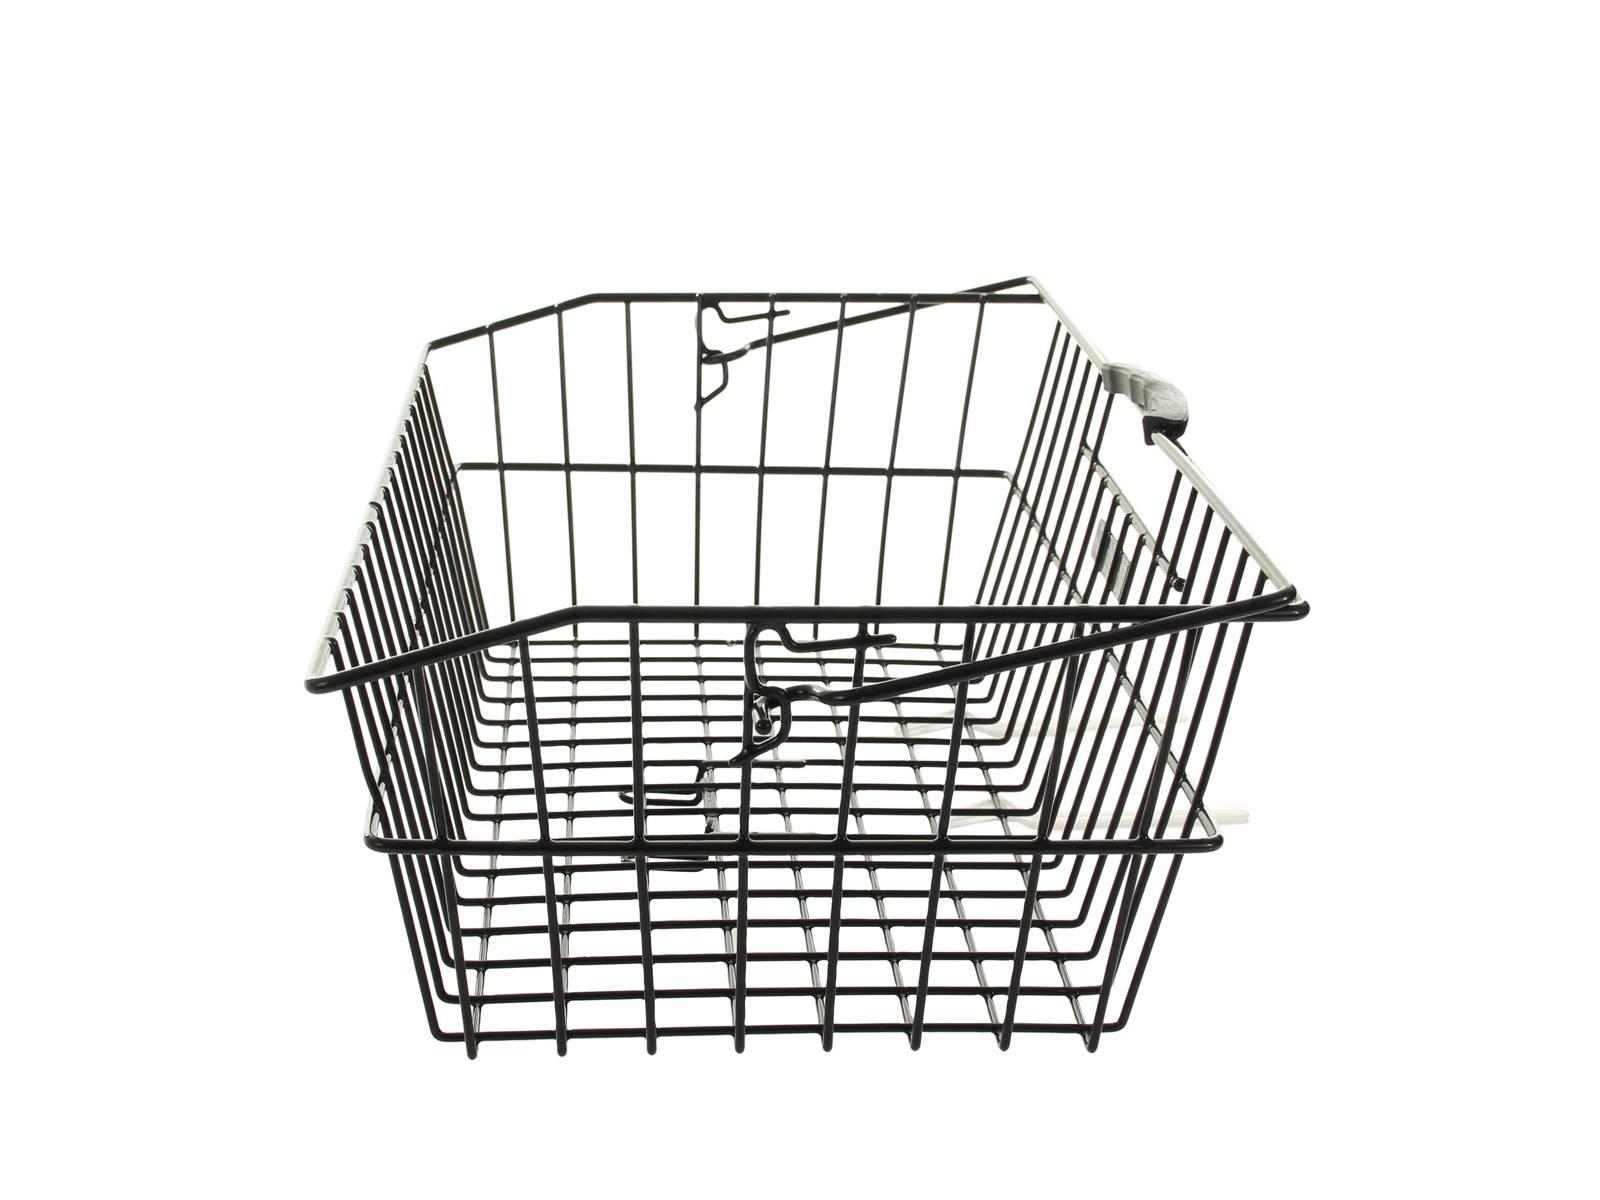 basil fahrradkorb hinten corsica fahrradkomfort. Black Bedroom Furniture Sets. Home Design Ideas